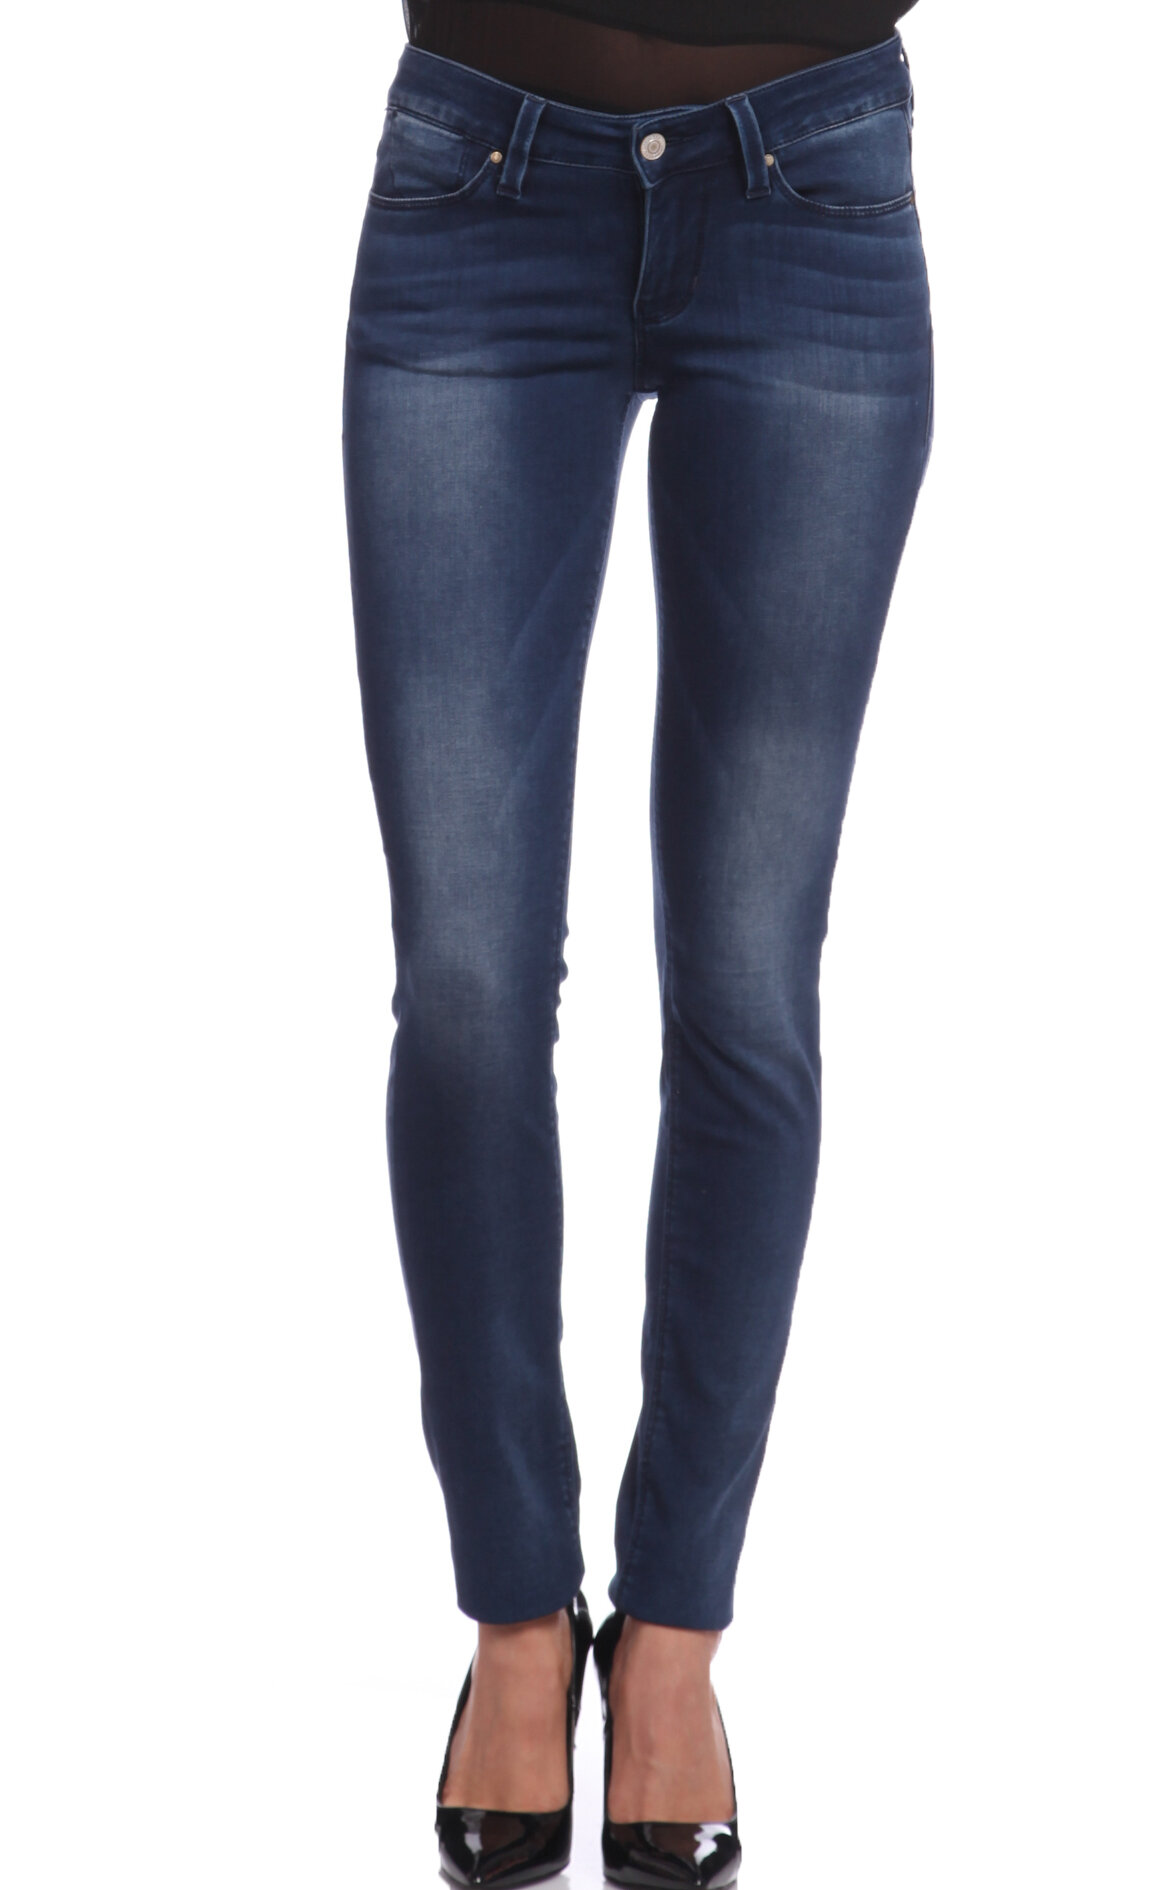 Guess-Guess Taşlanmış Skinny Denim Pantolon